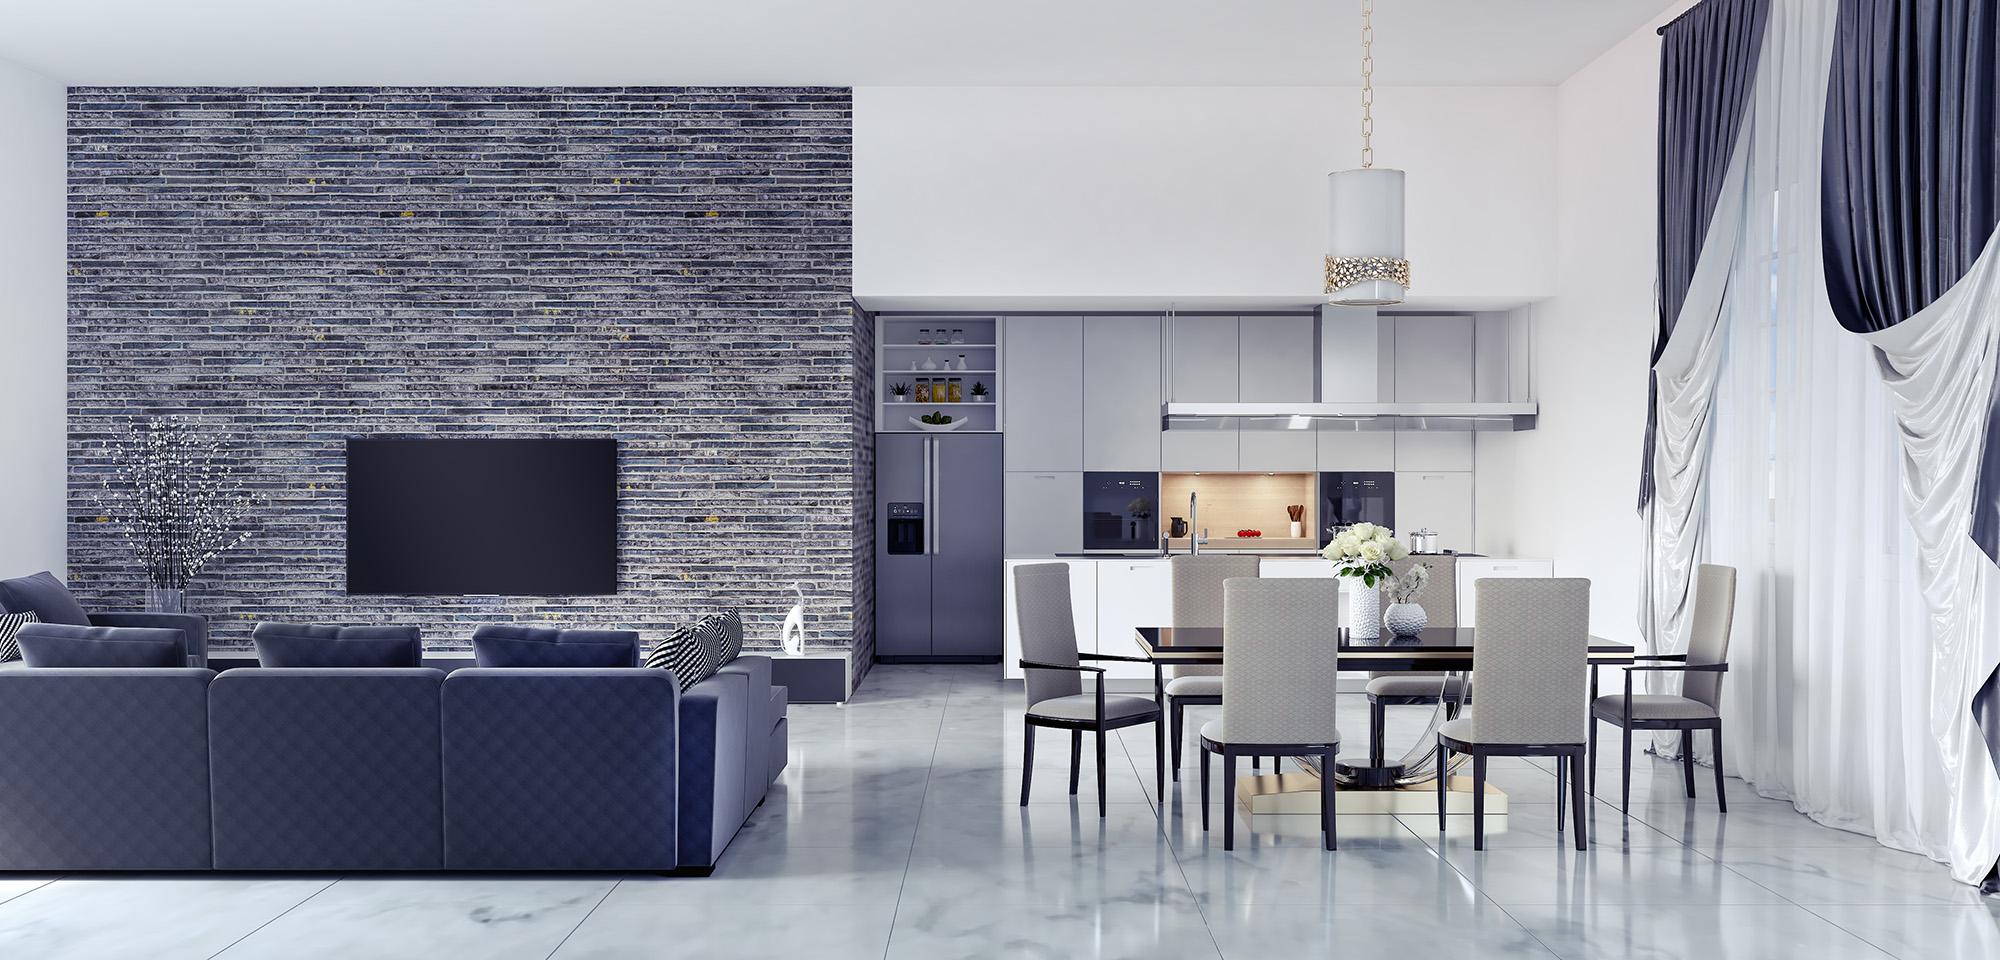 agence immobili re rodez vente location et estimation immobili re. Black Bedroom Furniture Sets. Home Design Ideas